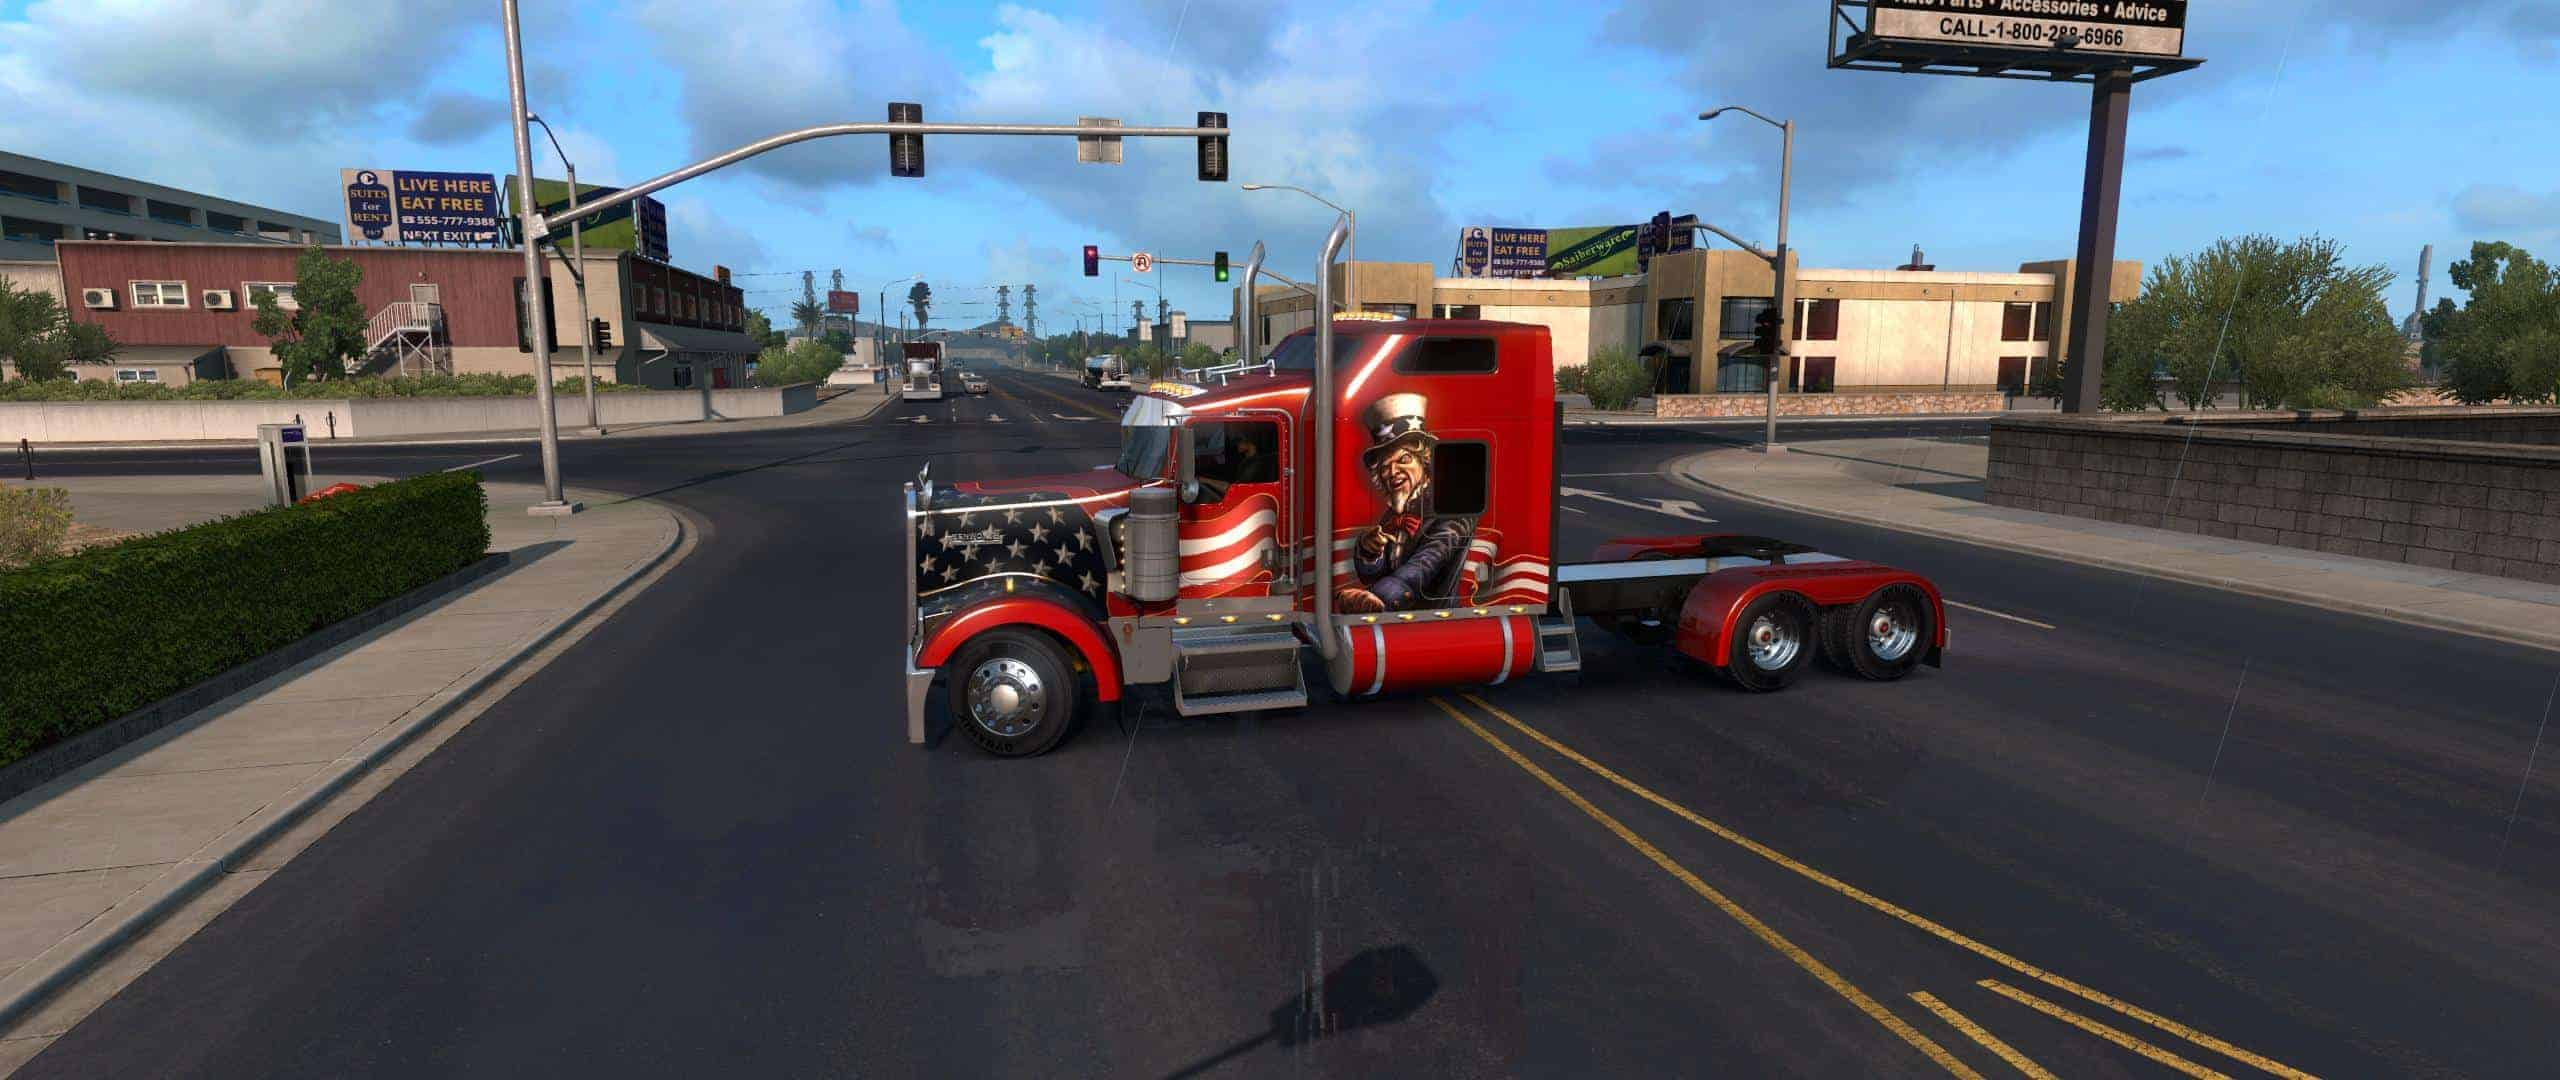 Kenworth W900L Truck by Big Bob v3 2 (1 32+) ATS - American Truck